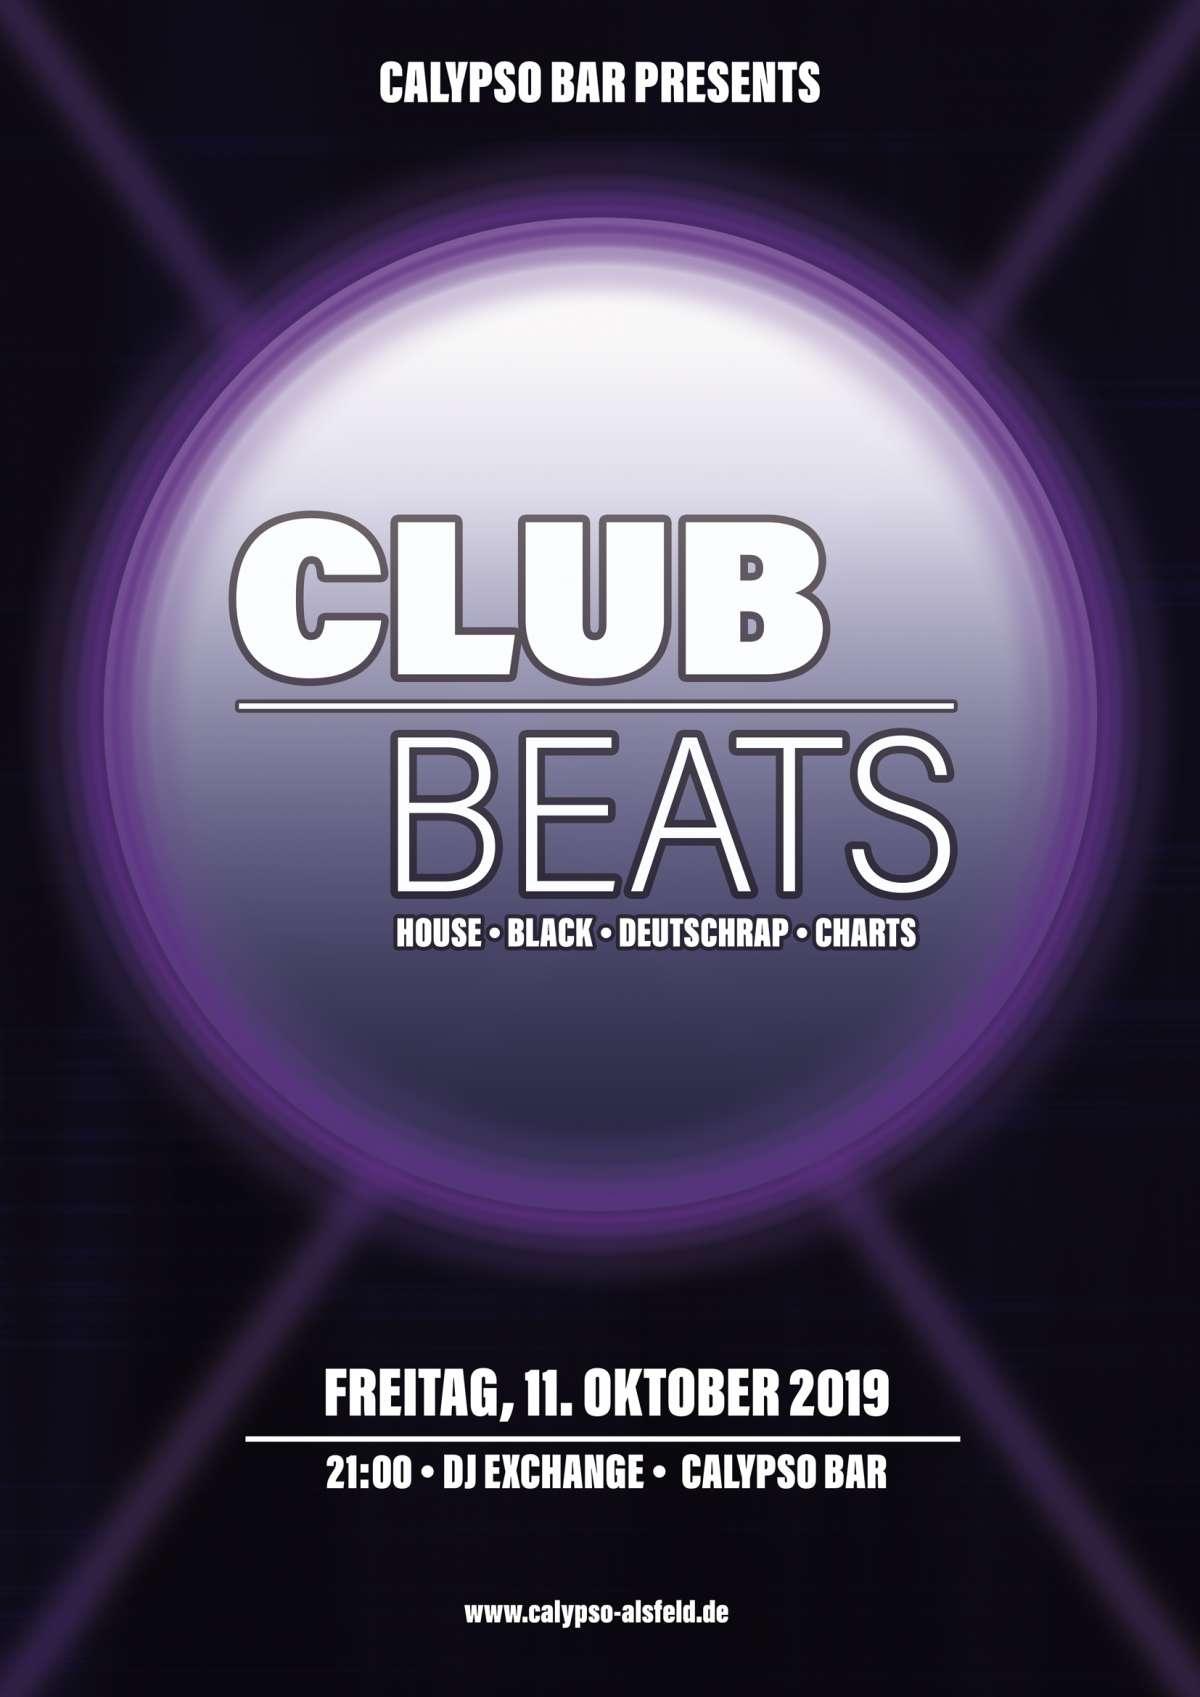 Club Beats - DJ Exchange - Calypso Bar - Alsfeld-Altenburg